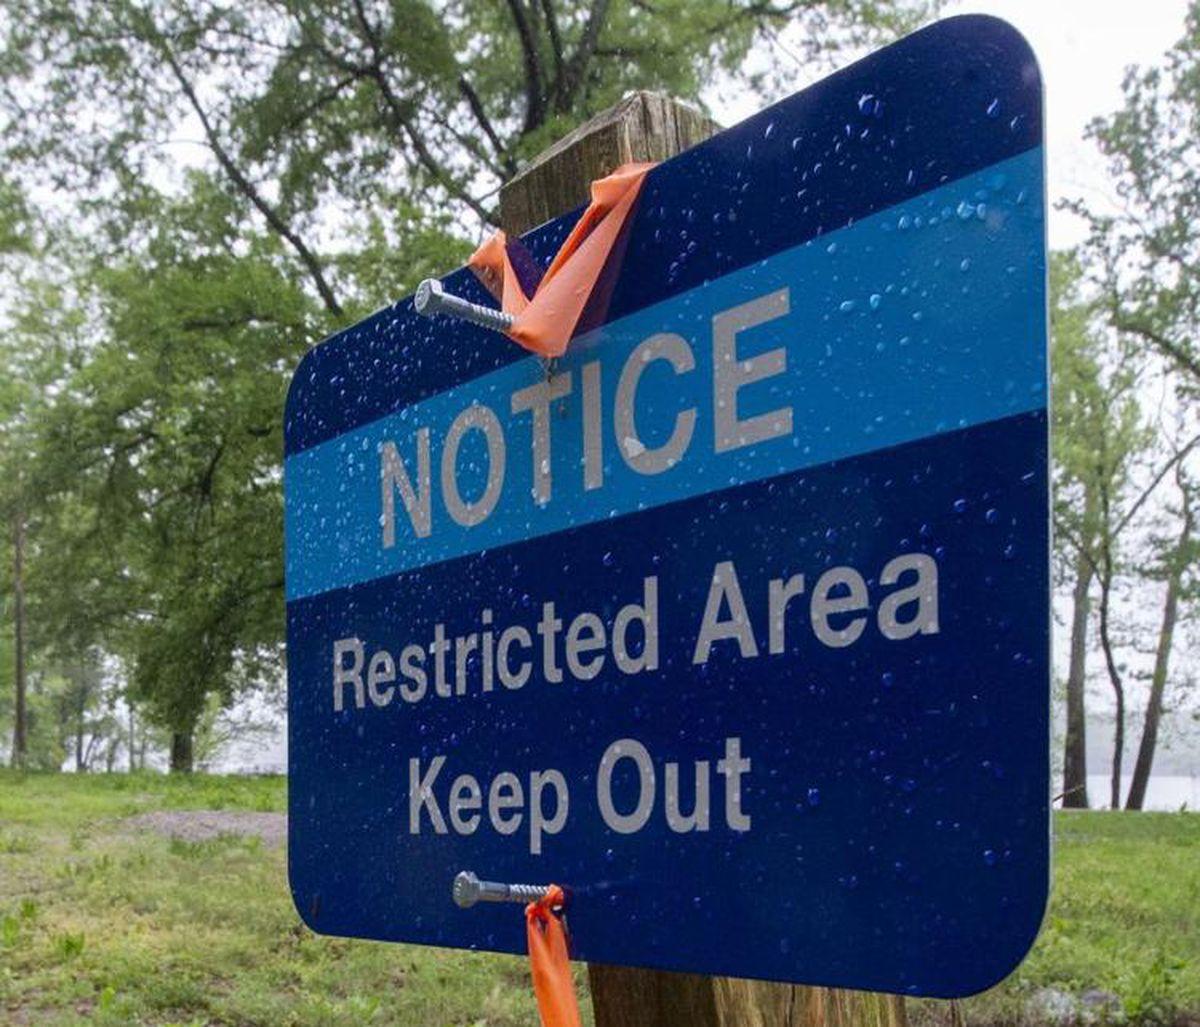 TVA Rockpile Recreation area closed